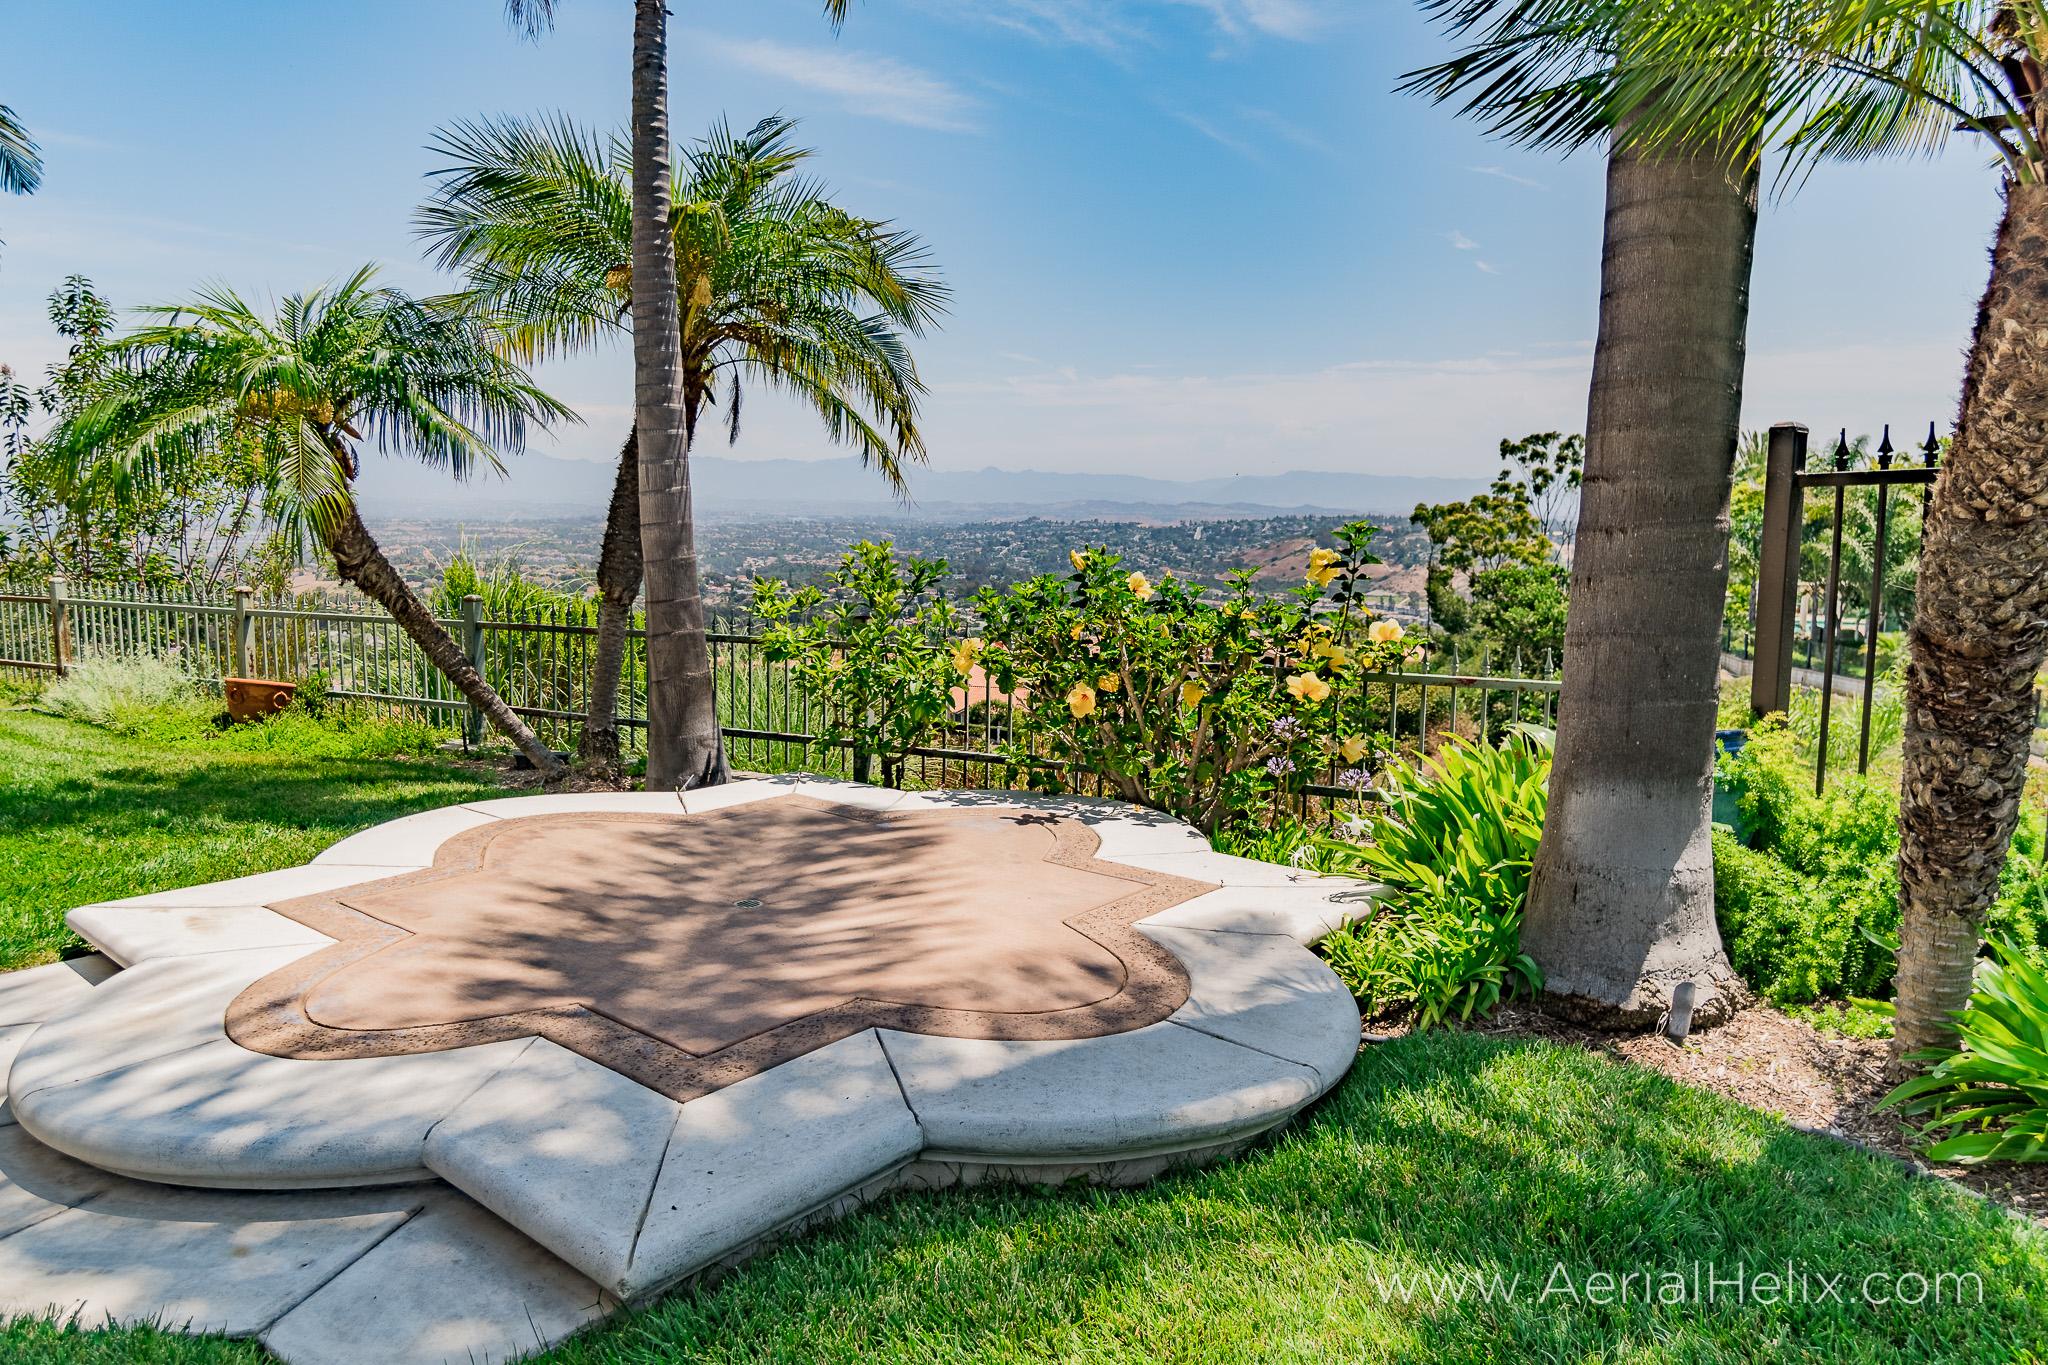 HELIX - Vista Montemar - real-estate-photographer-2.jpg